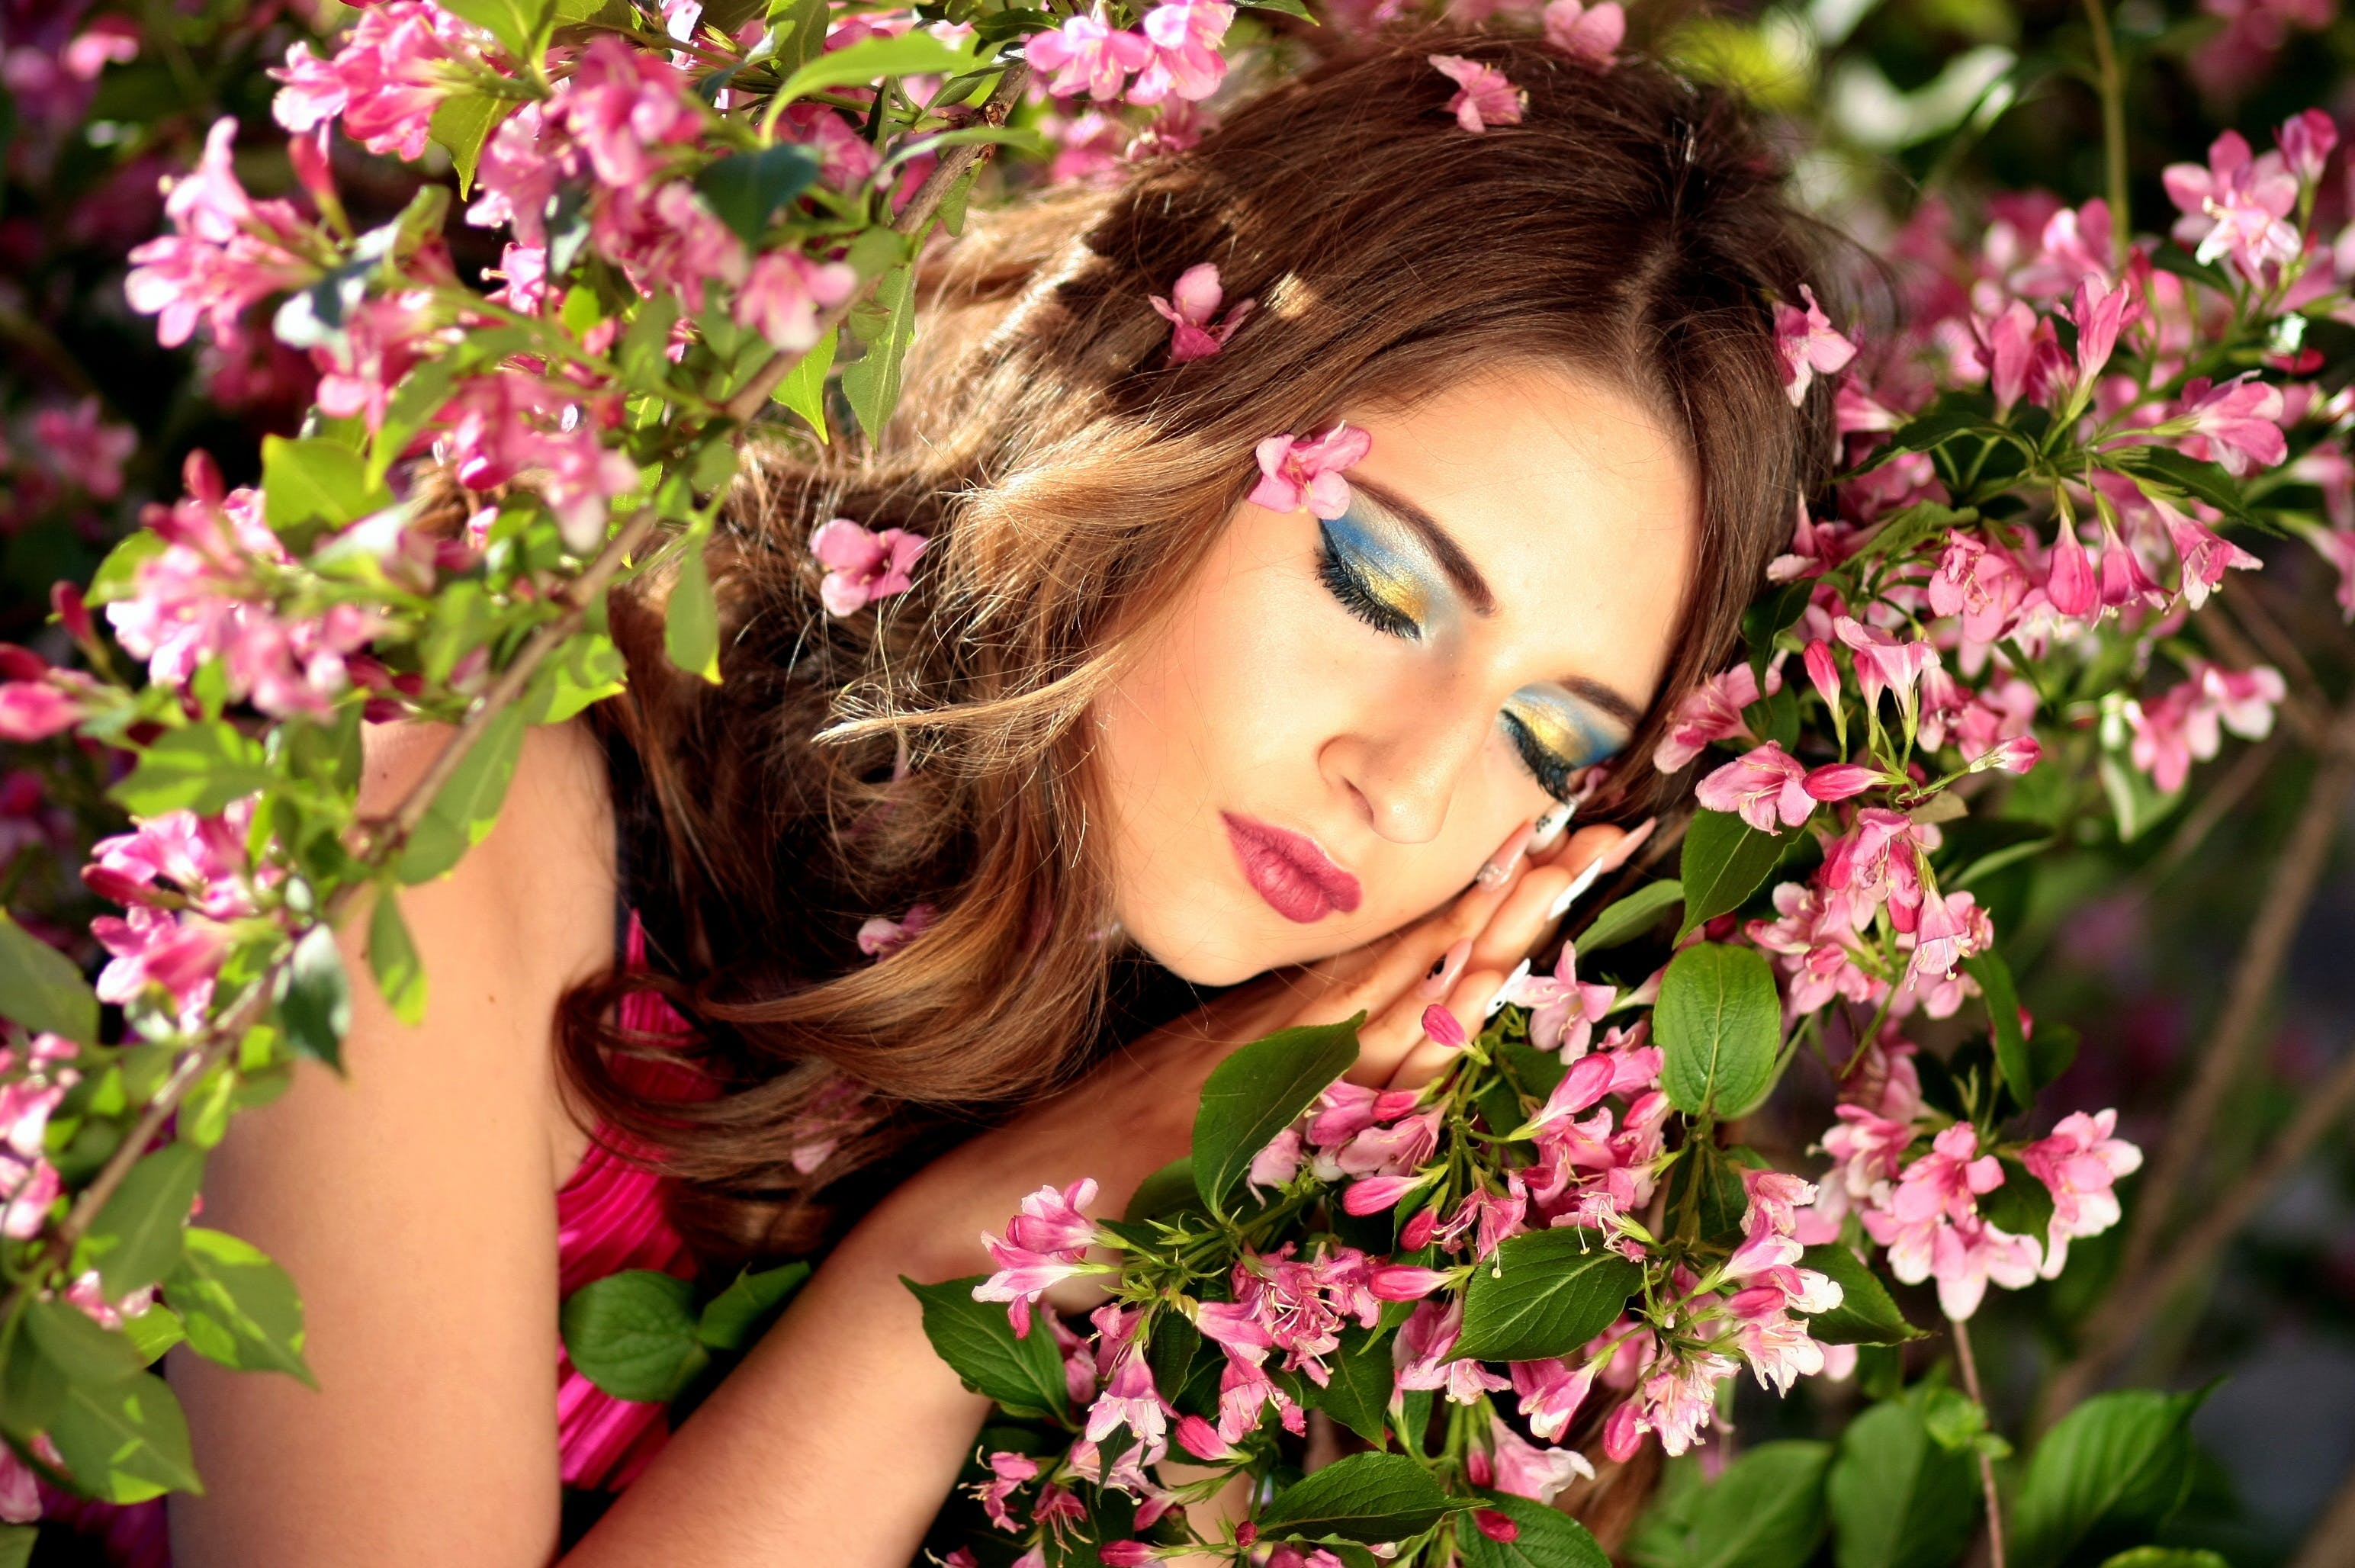 Woman Sleeping on Pink Flowers